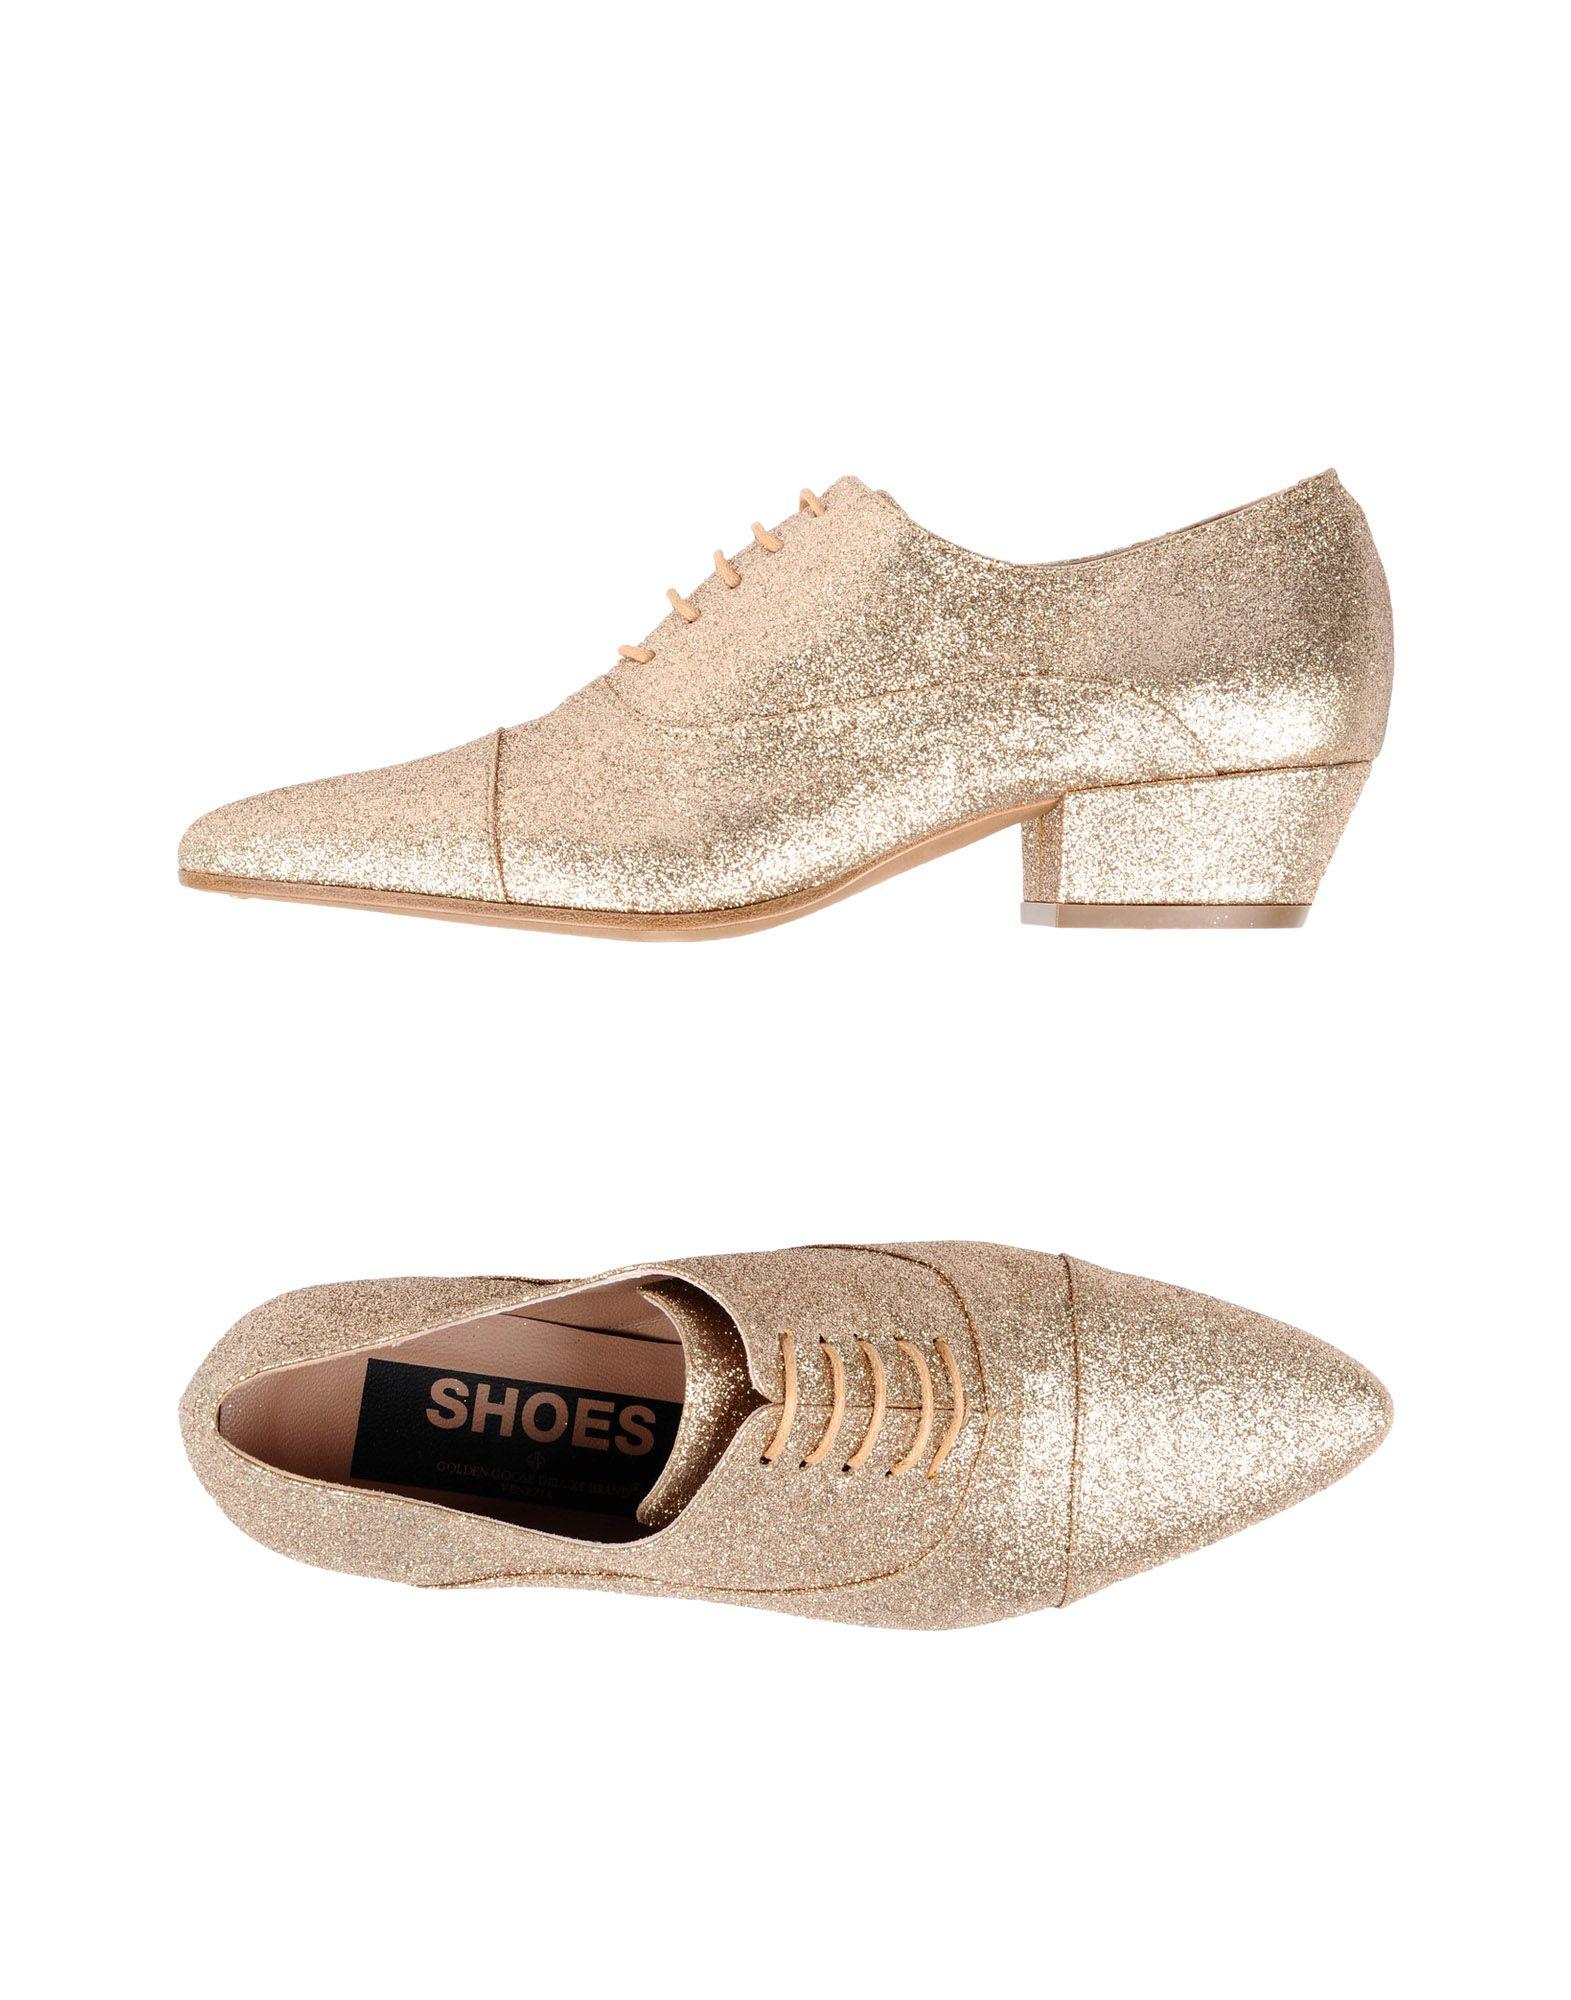 Golden Goose Deluxe Brand Schnürschuhe Damen Neue  11465896XX Neue Damen Schuhe 2ceaf6